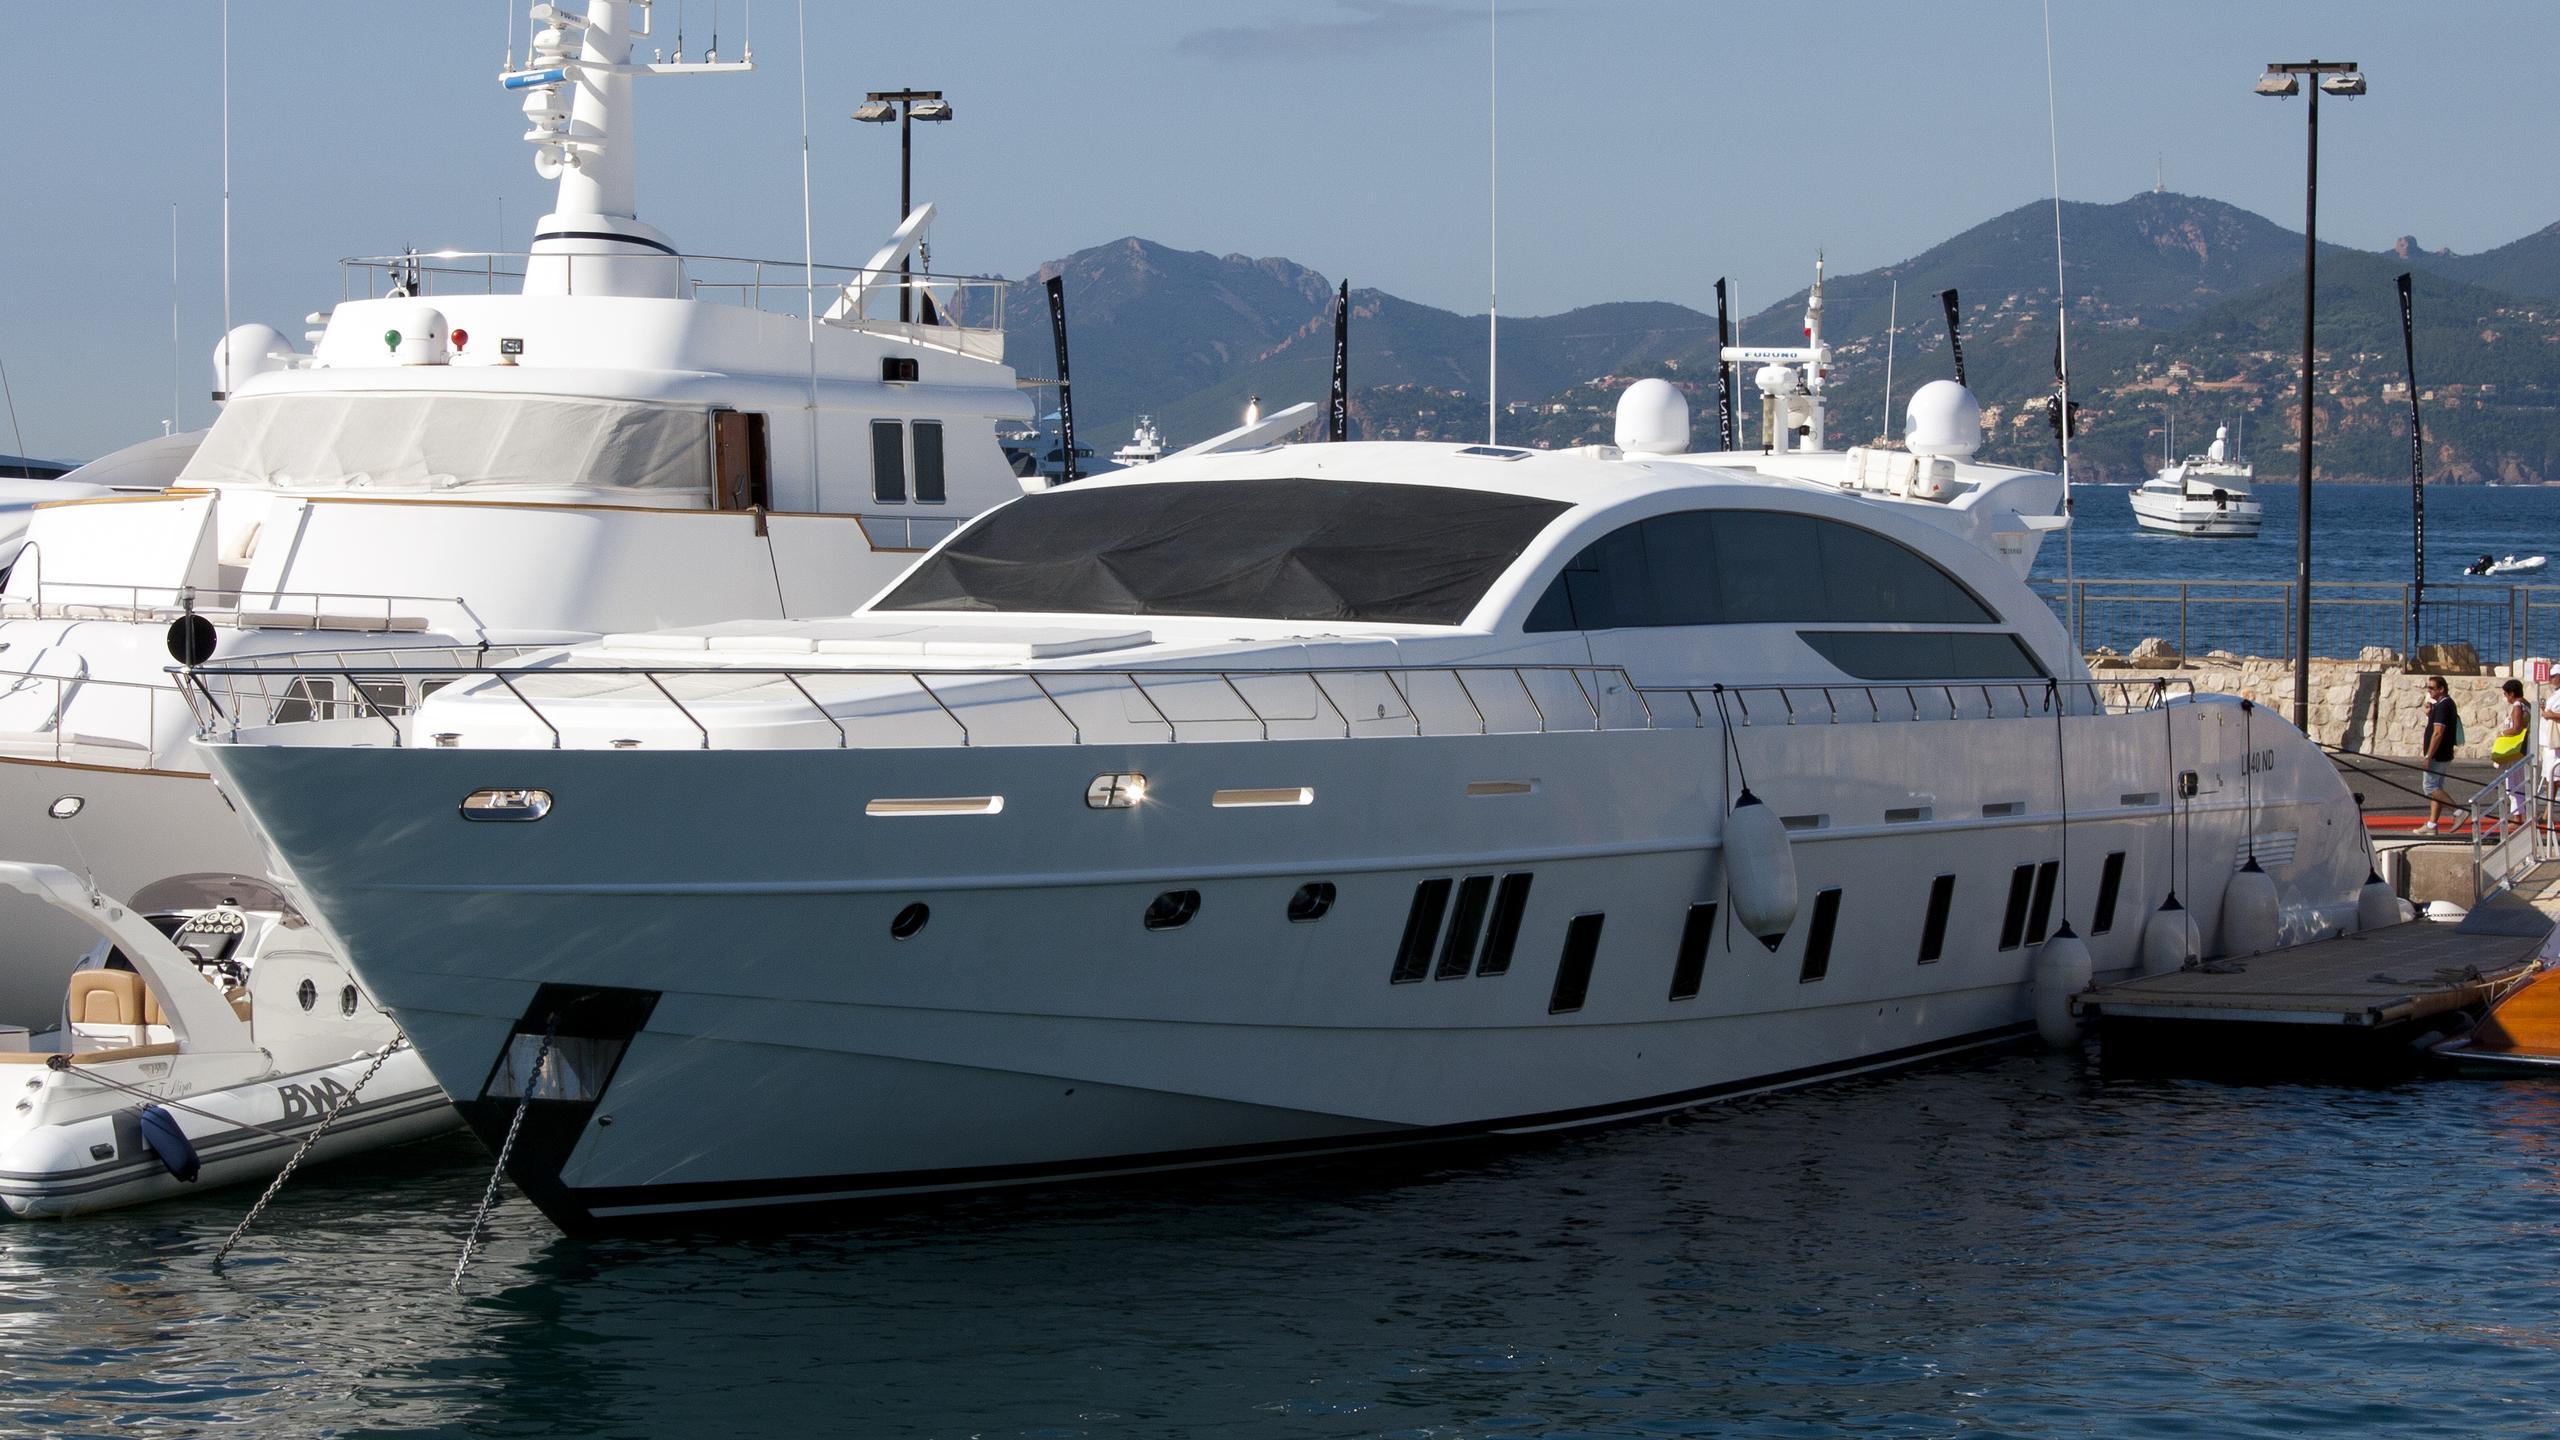 blue jay lake daimon motoryacht tecnomar 36m 2009 half profile before refit